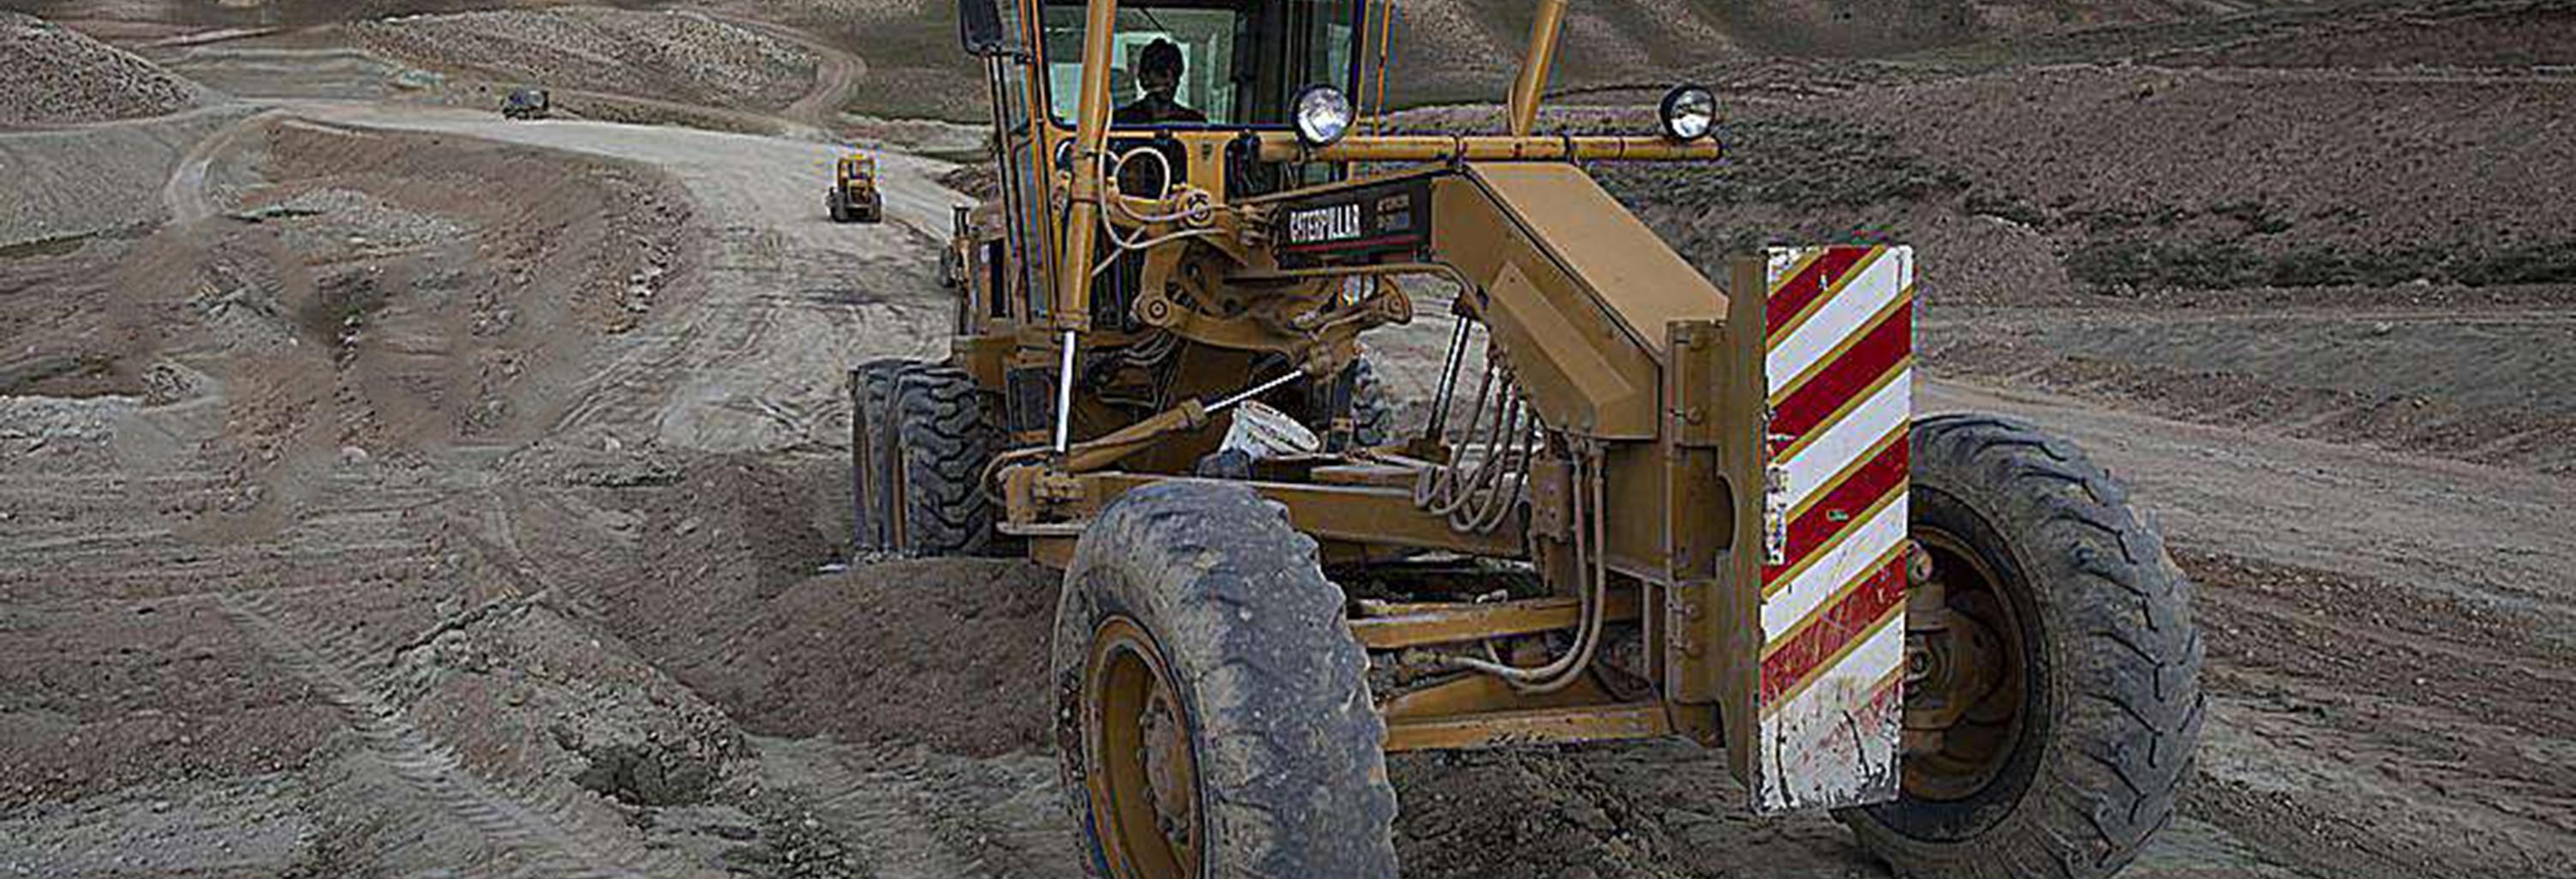 Engine Driven Equipment